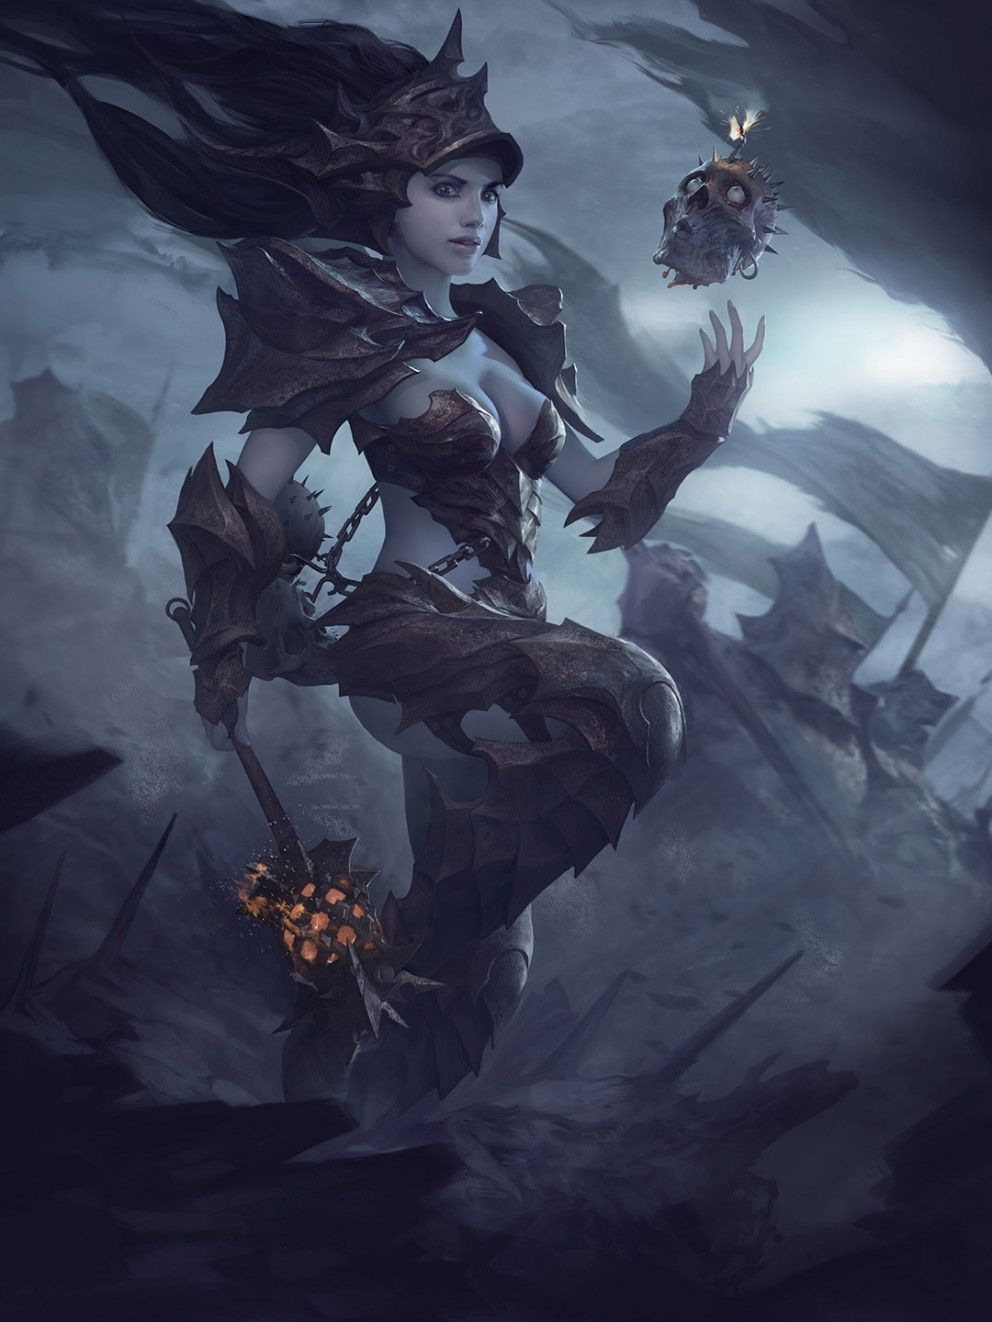 Fantasy-Art-Arthur-Bozonnet-Hellkin-Grenadier-992x1322.jpg (992×1322)